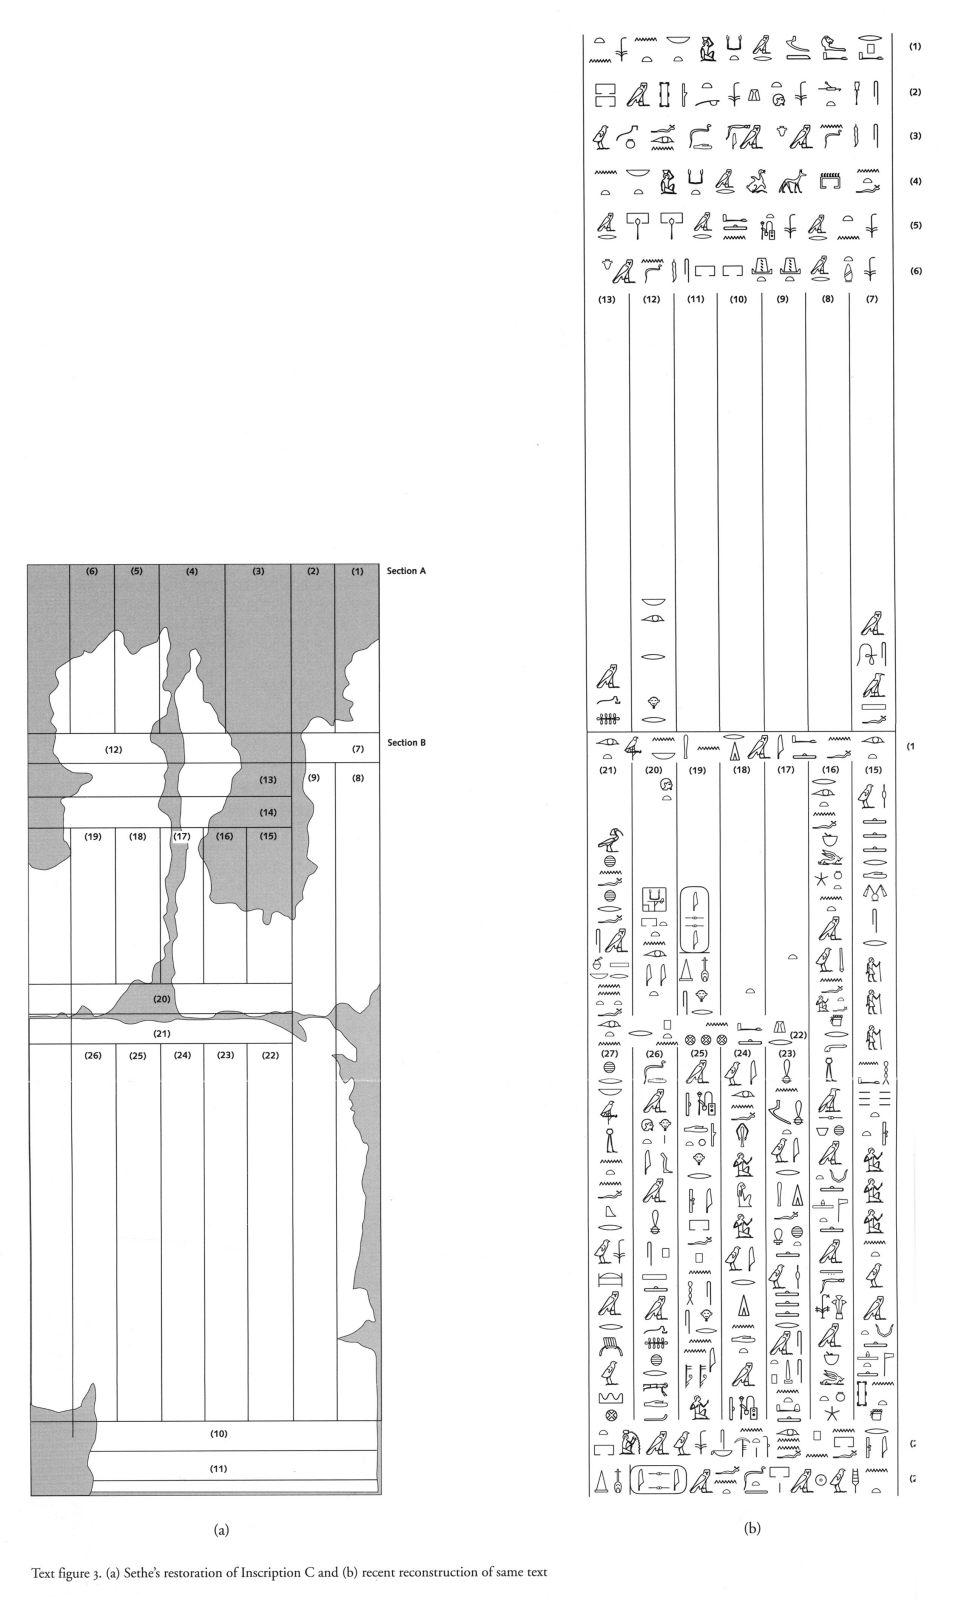 Drawings: G 2370: Inscription C, restoration